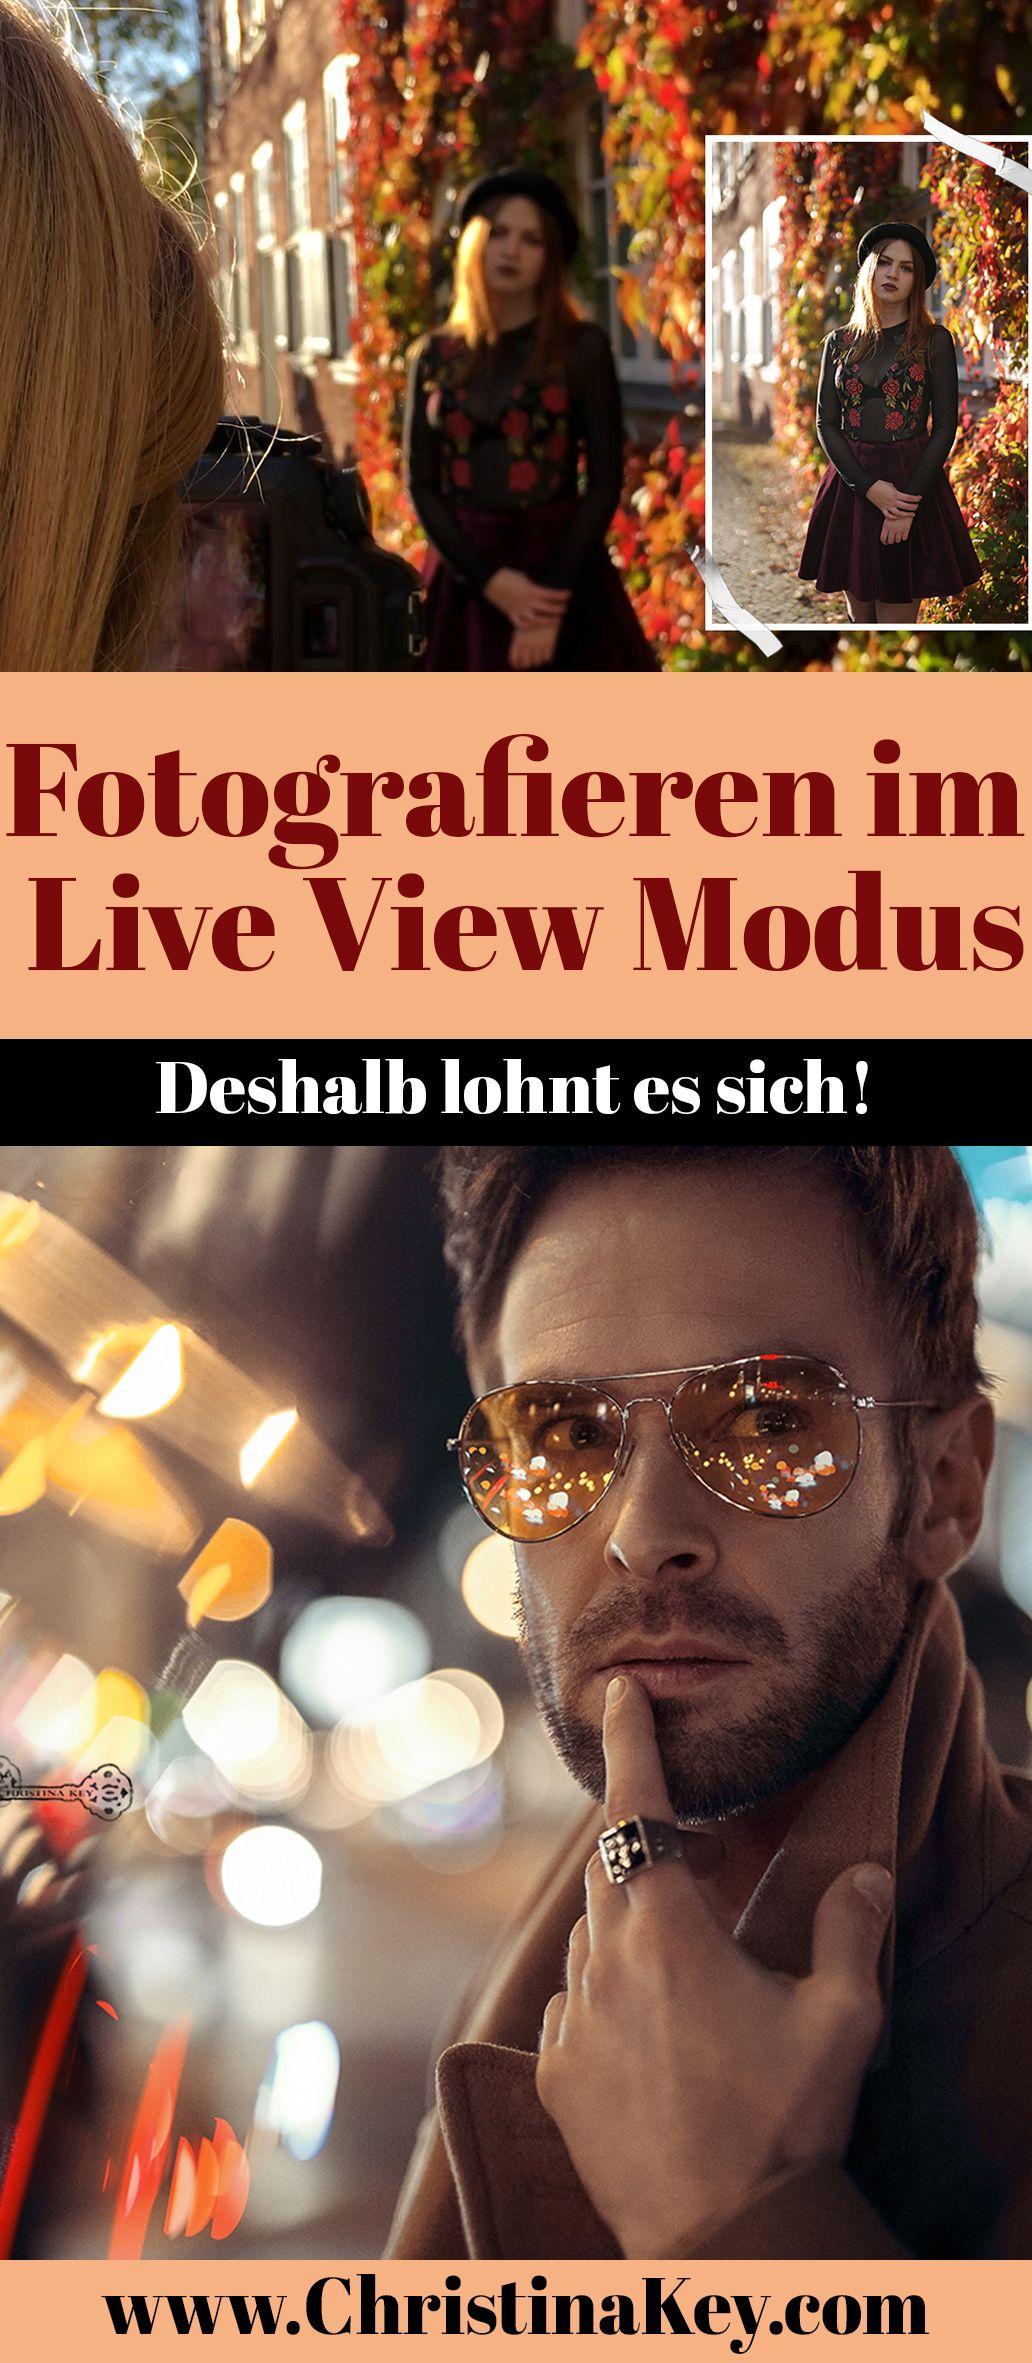 Fotografieren im Live View Modus | Fototipps, Fotografie ...